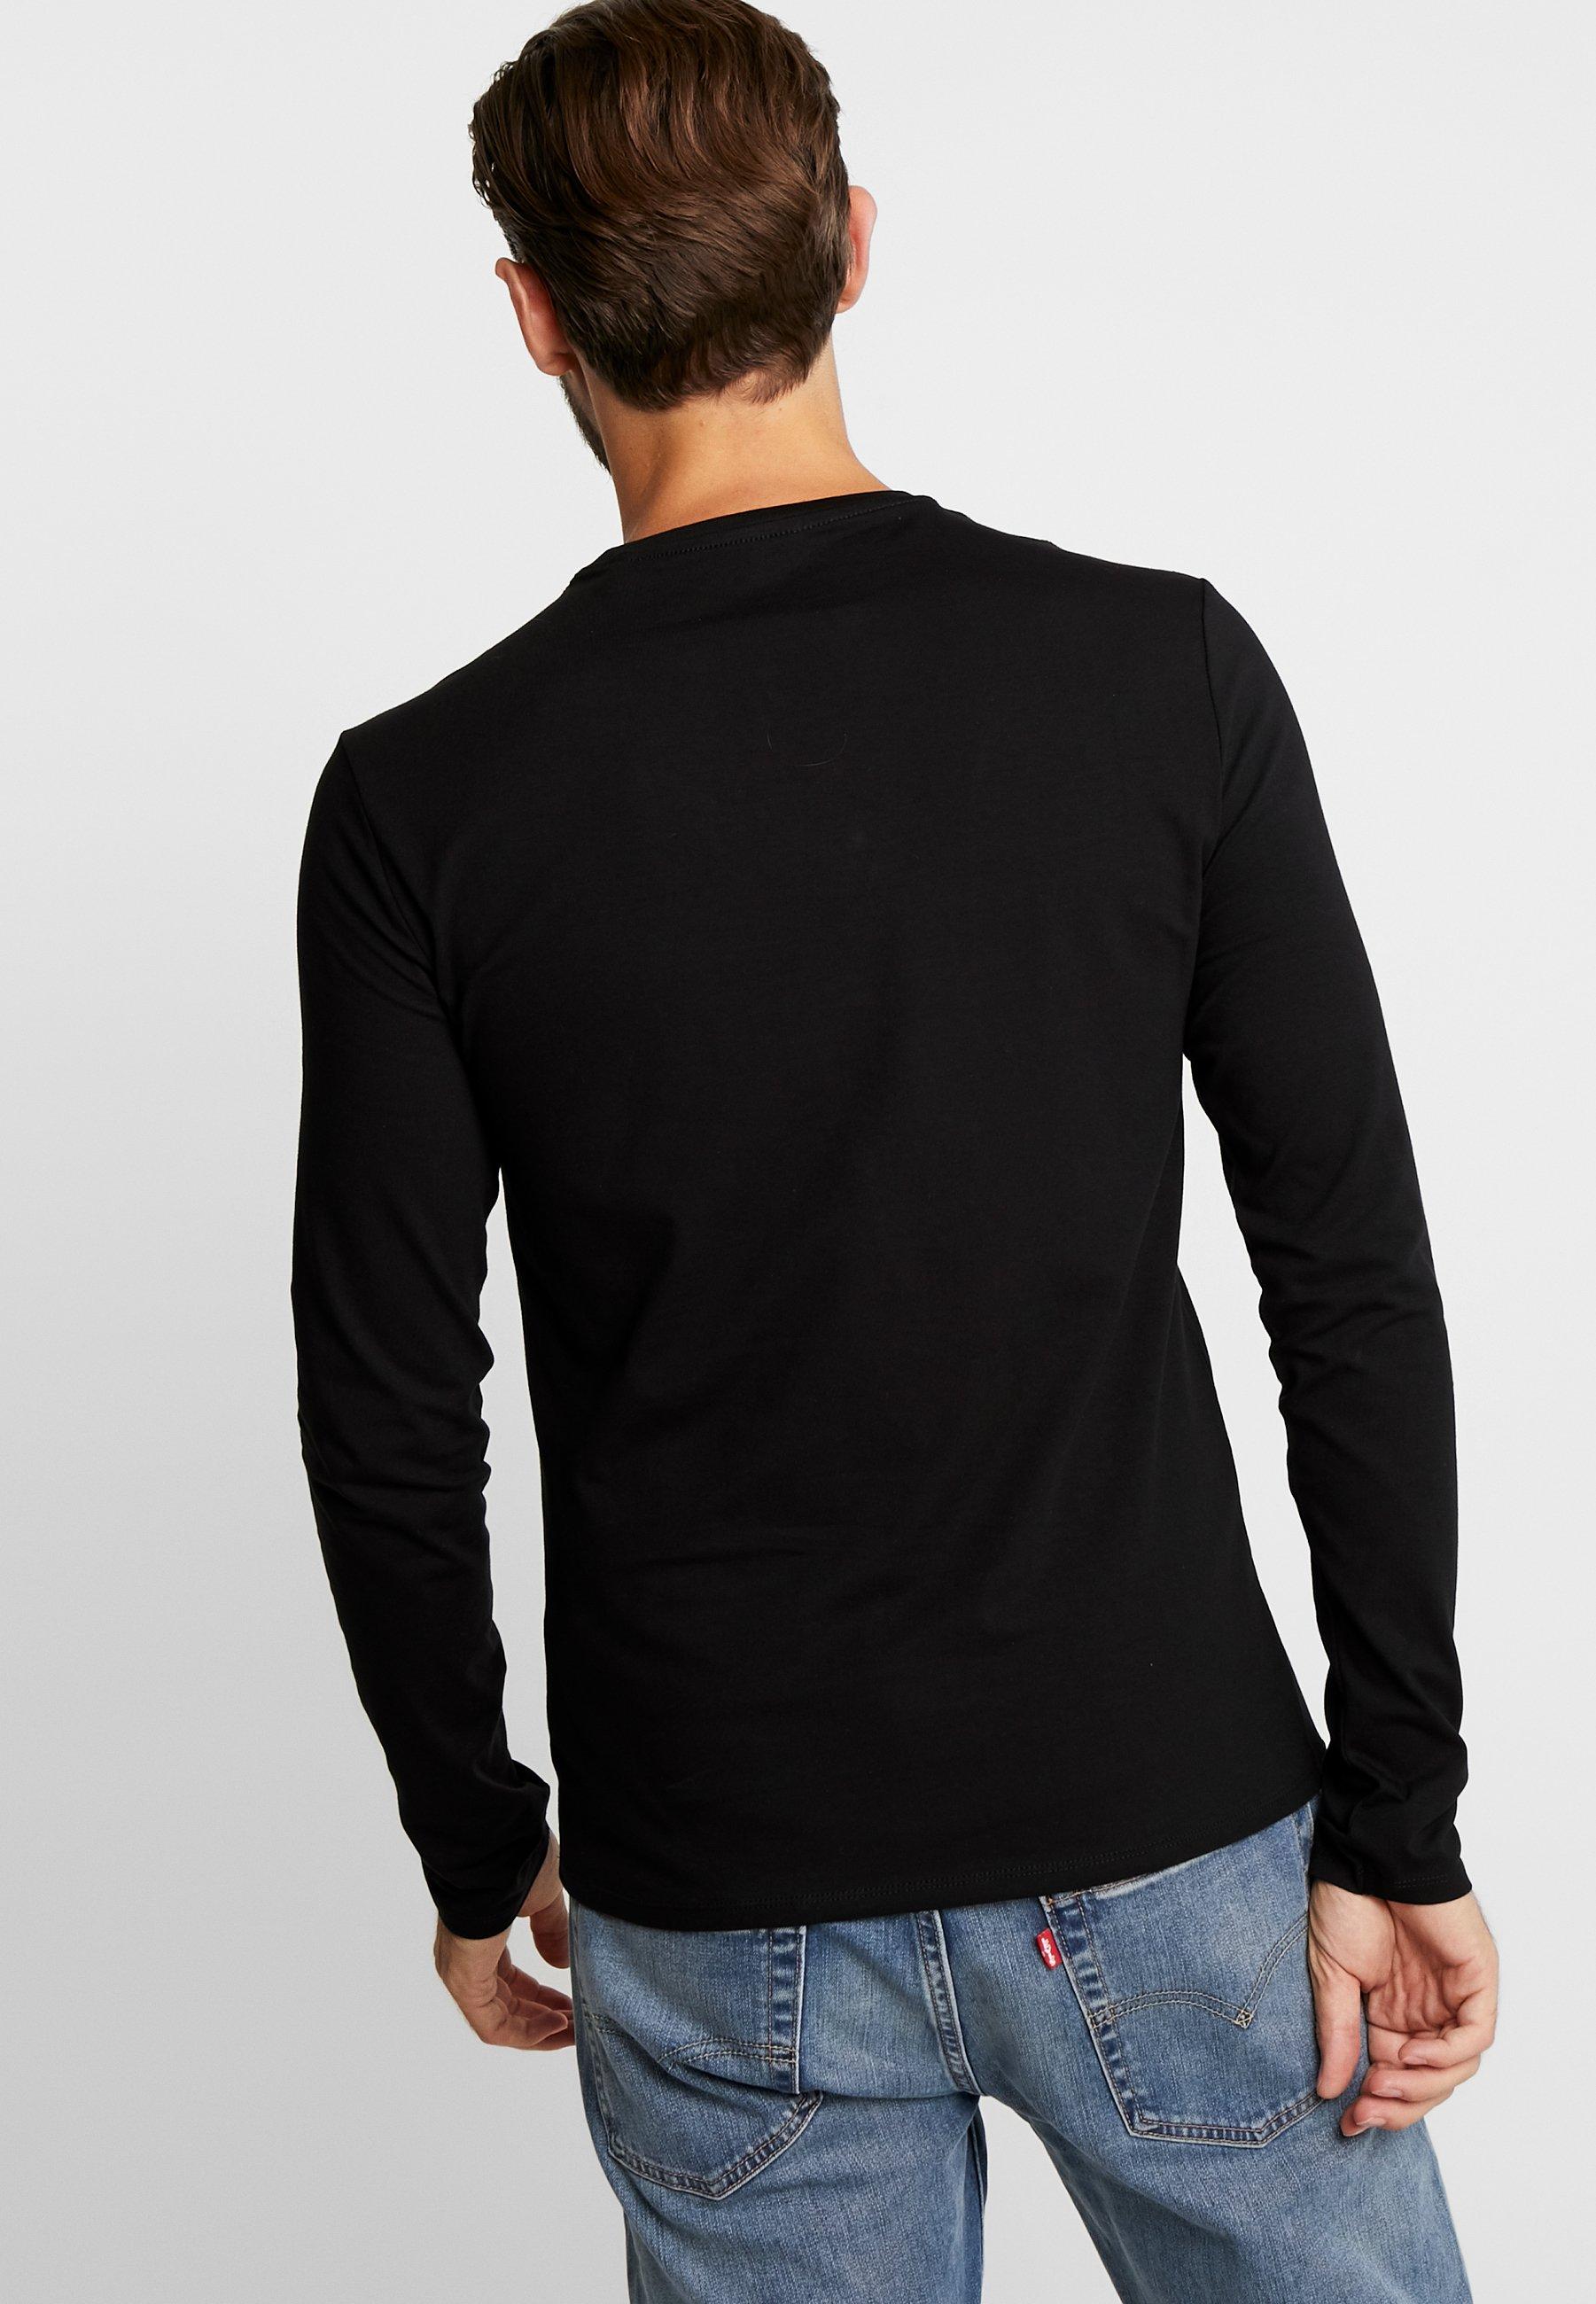 Guess Original Logo À Manches TeeT shirt Jet Core Black Longues 9DIH2eWYbE